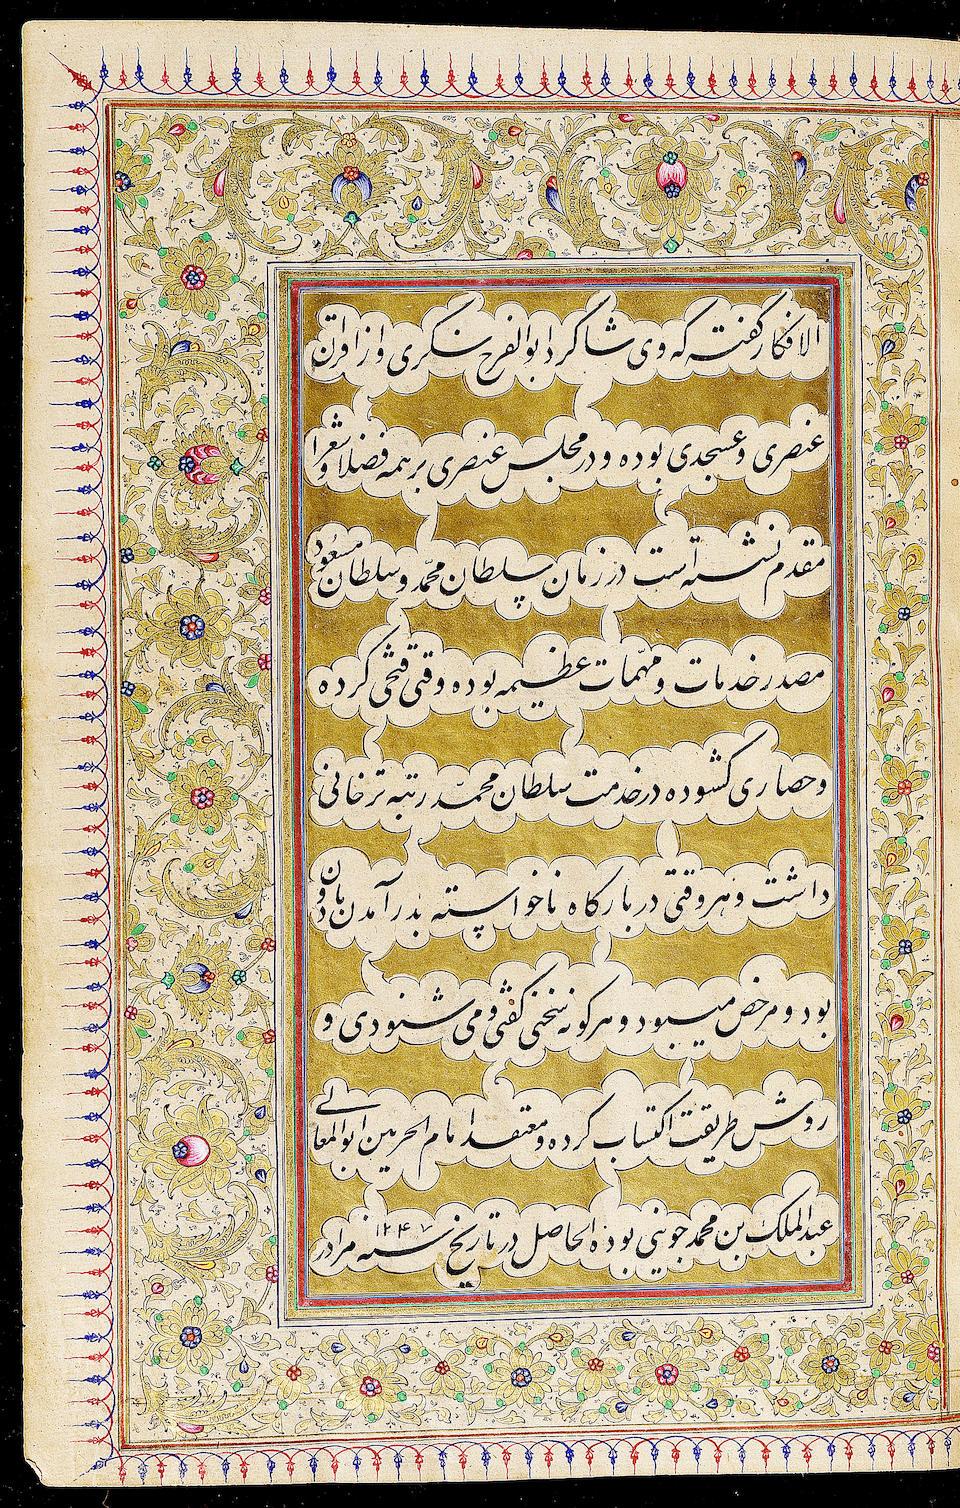 Hakim Manuchehri Damghani, Divan, illuminated manuscript with lacquer binding incorporating photographs of Prince Dust Muhammad Khan, Mu'ayyir al-Mamalik Qajar Persia, dated AH 1294-95/AD 1877-78